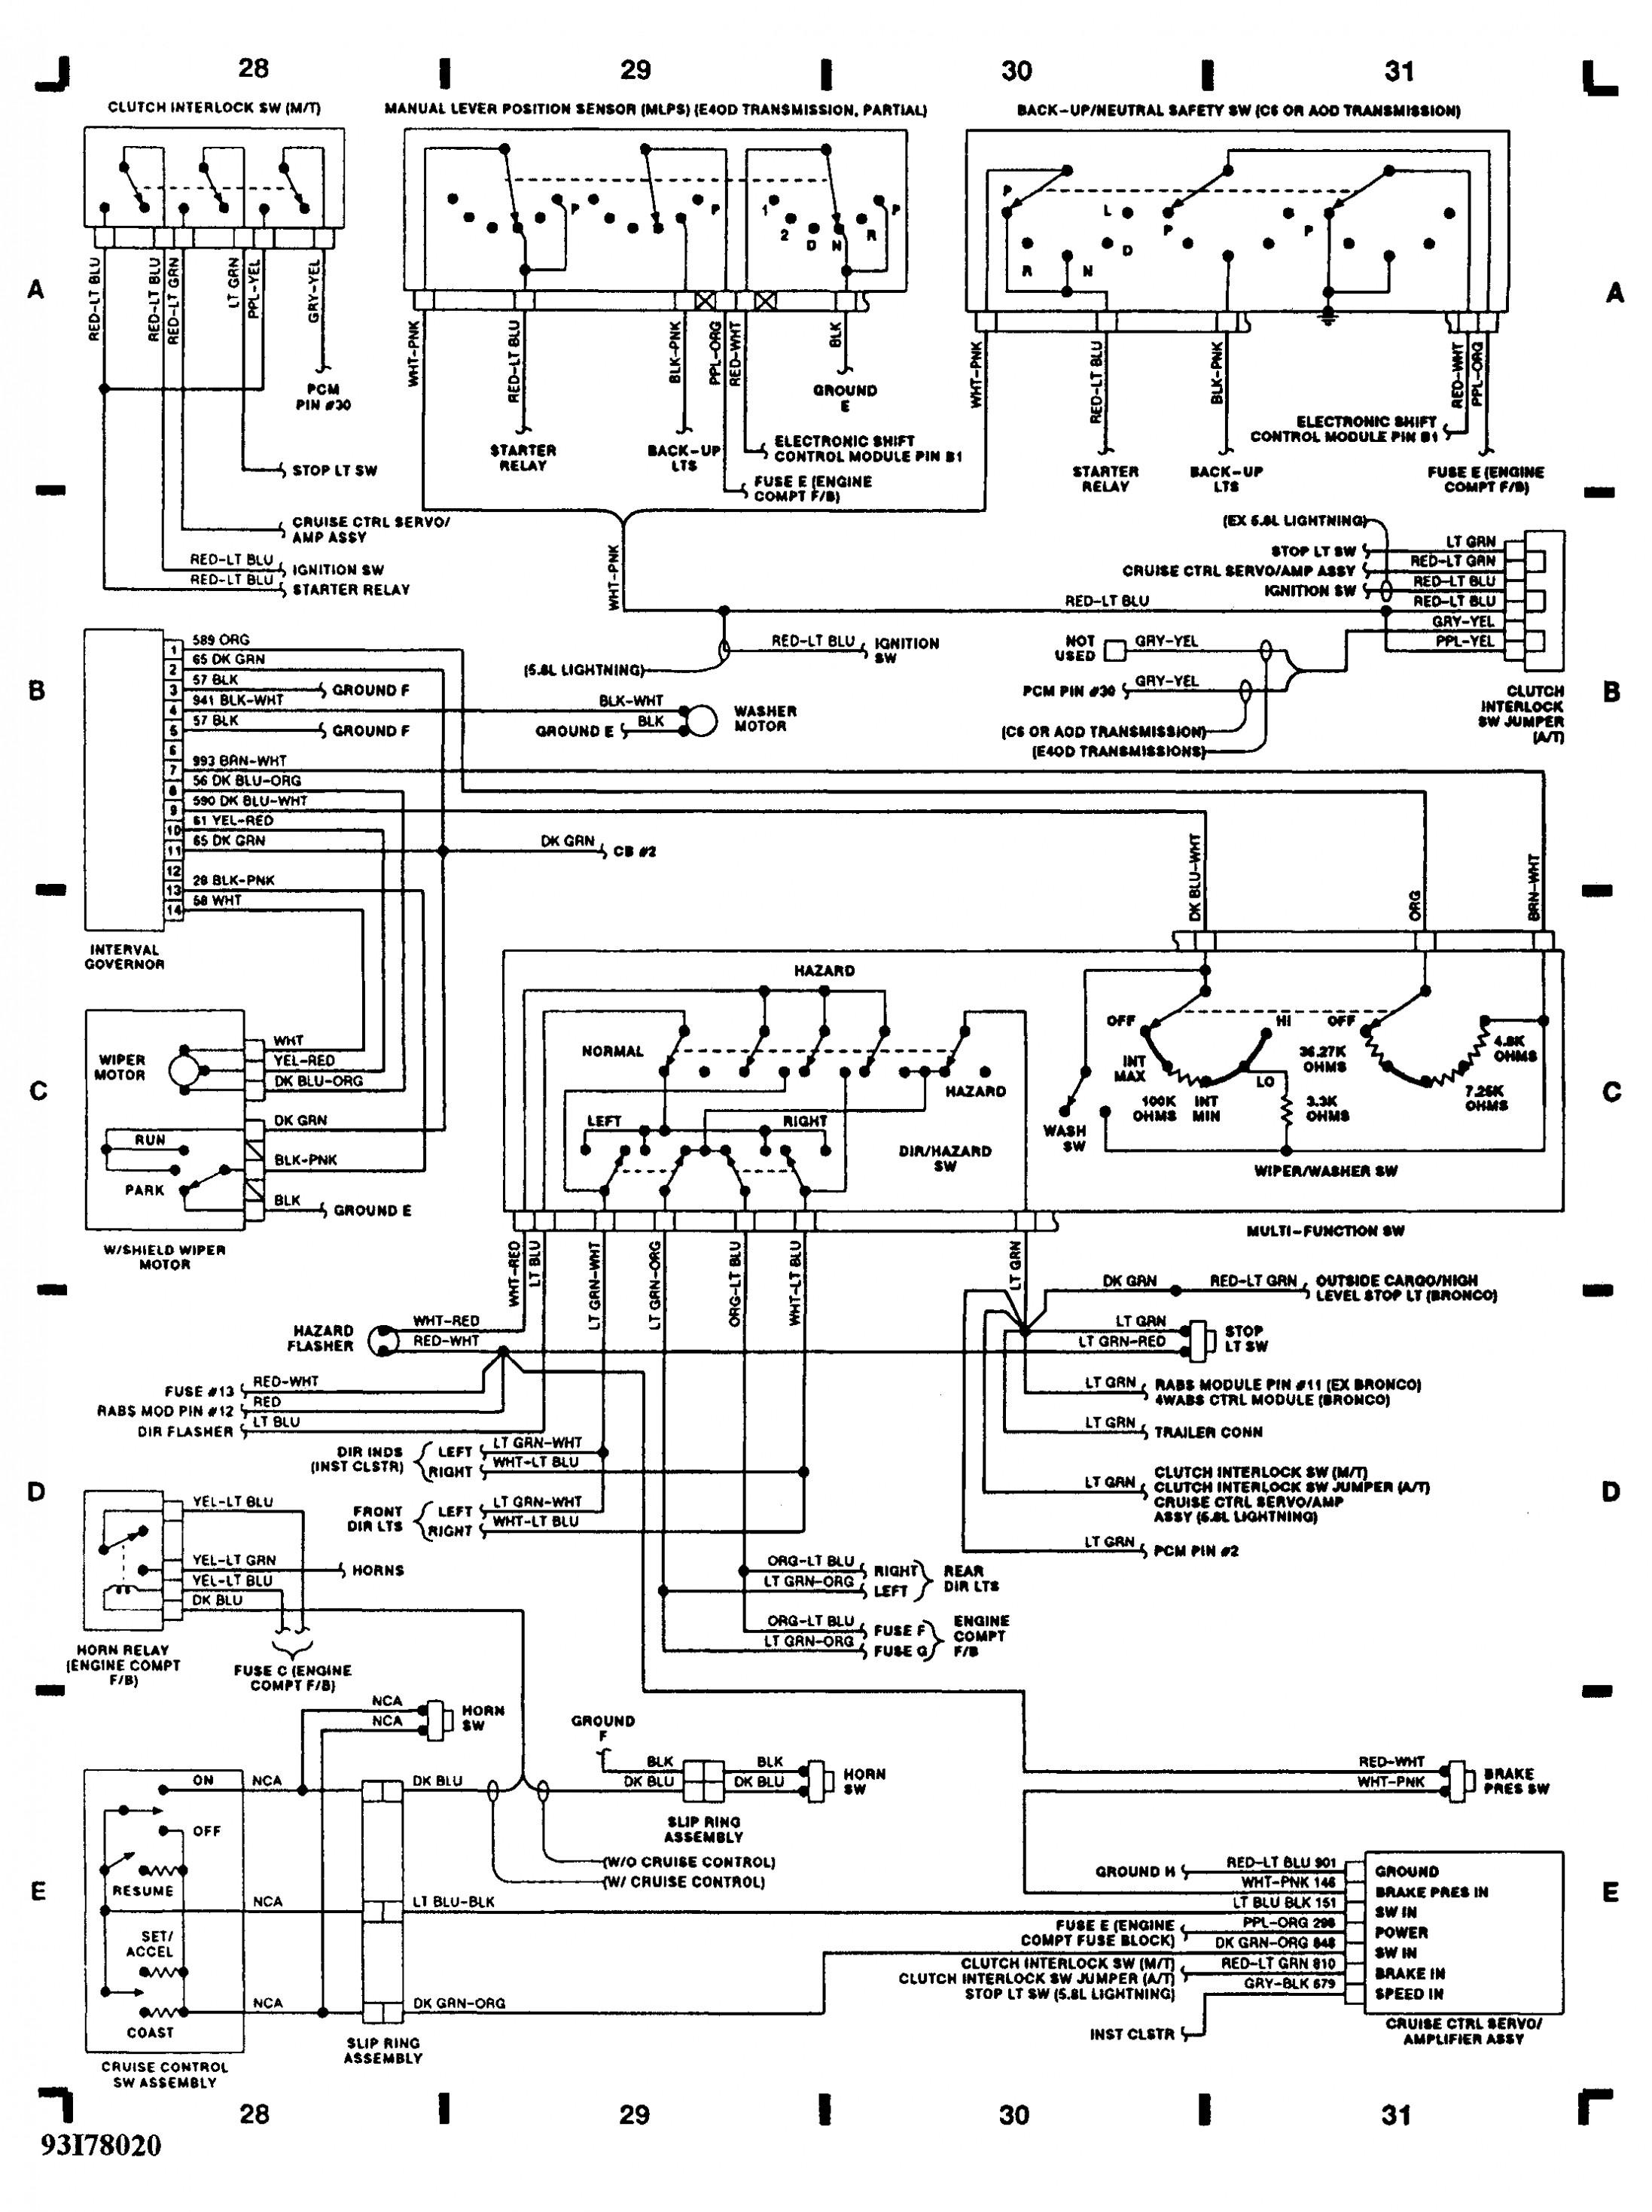 2001 International 9100i Fuse Box Diagram Diagram] International 9900i Eagle Fuse Box Diagram Full Of 2001 International 9100i Fuse Box Diagram